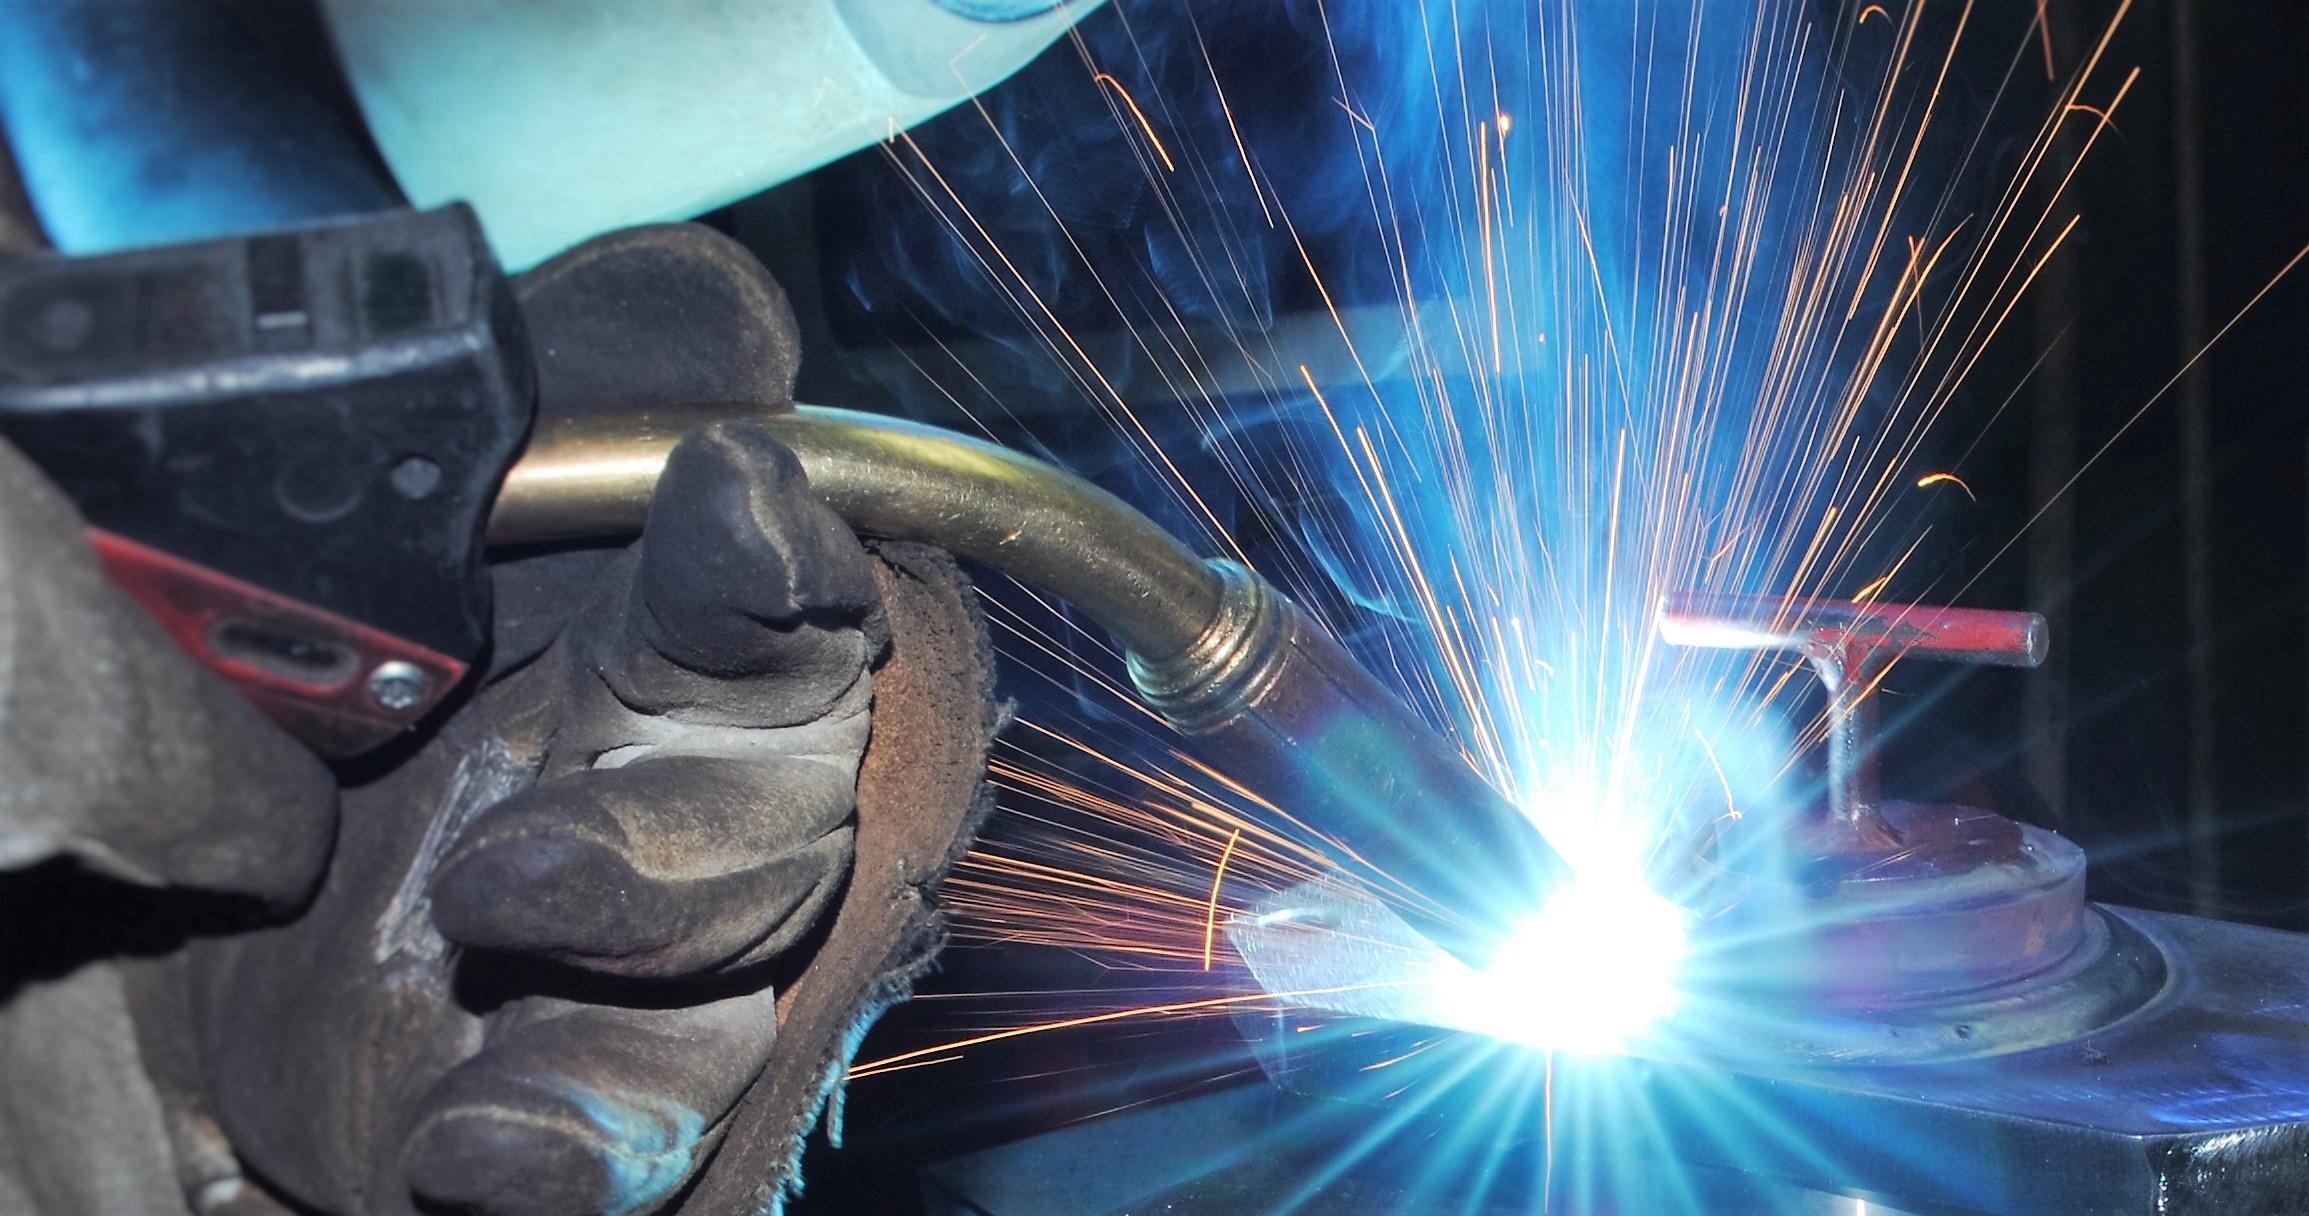 Free Images : welding, machine, welder, screenshot, washer ...